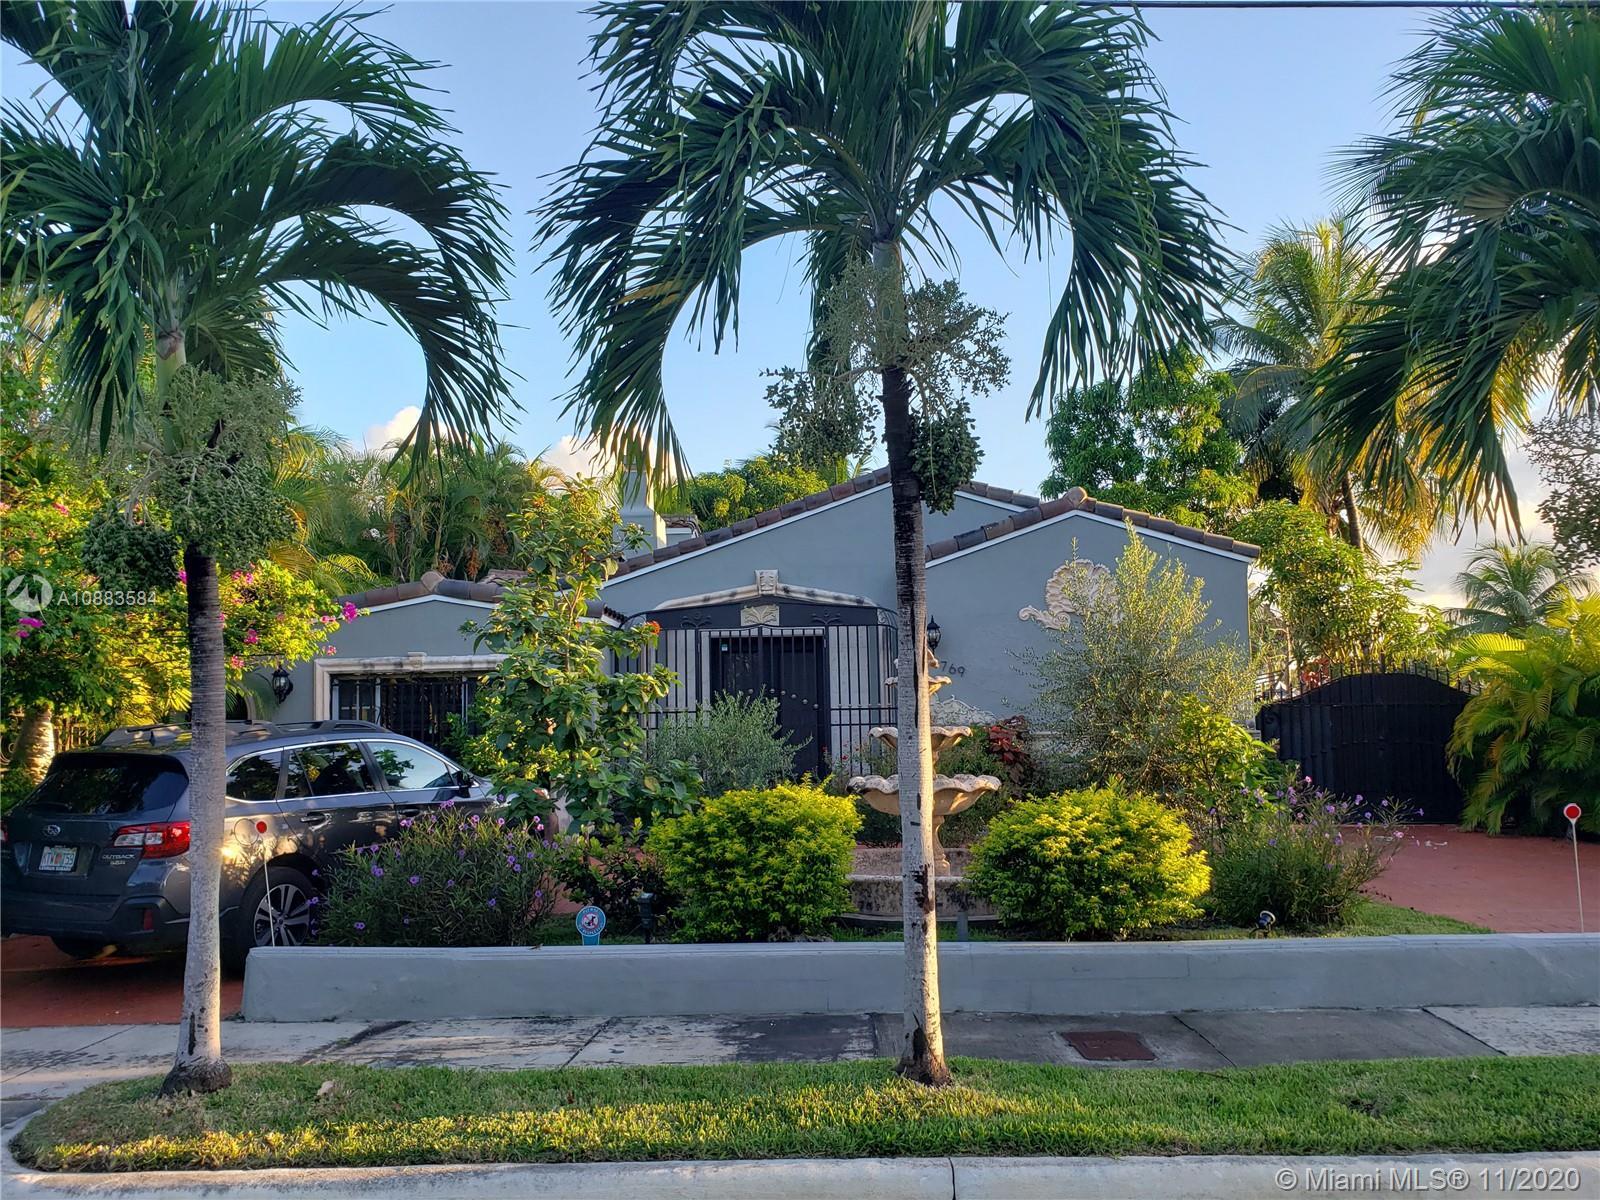 769 NE 77th Ter, Miami, Florida 33138, 3 Bedrooms Bedrooms, ,4 BathroomsBathrooms,Residential,For Sale,769 NE 77th Ter,A10883584